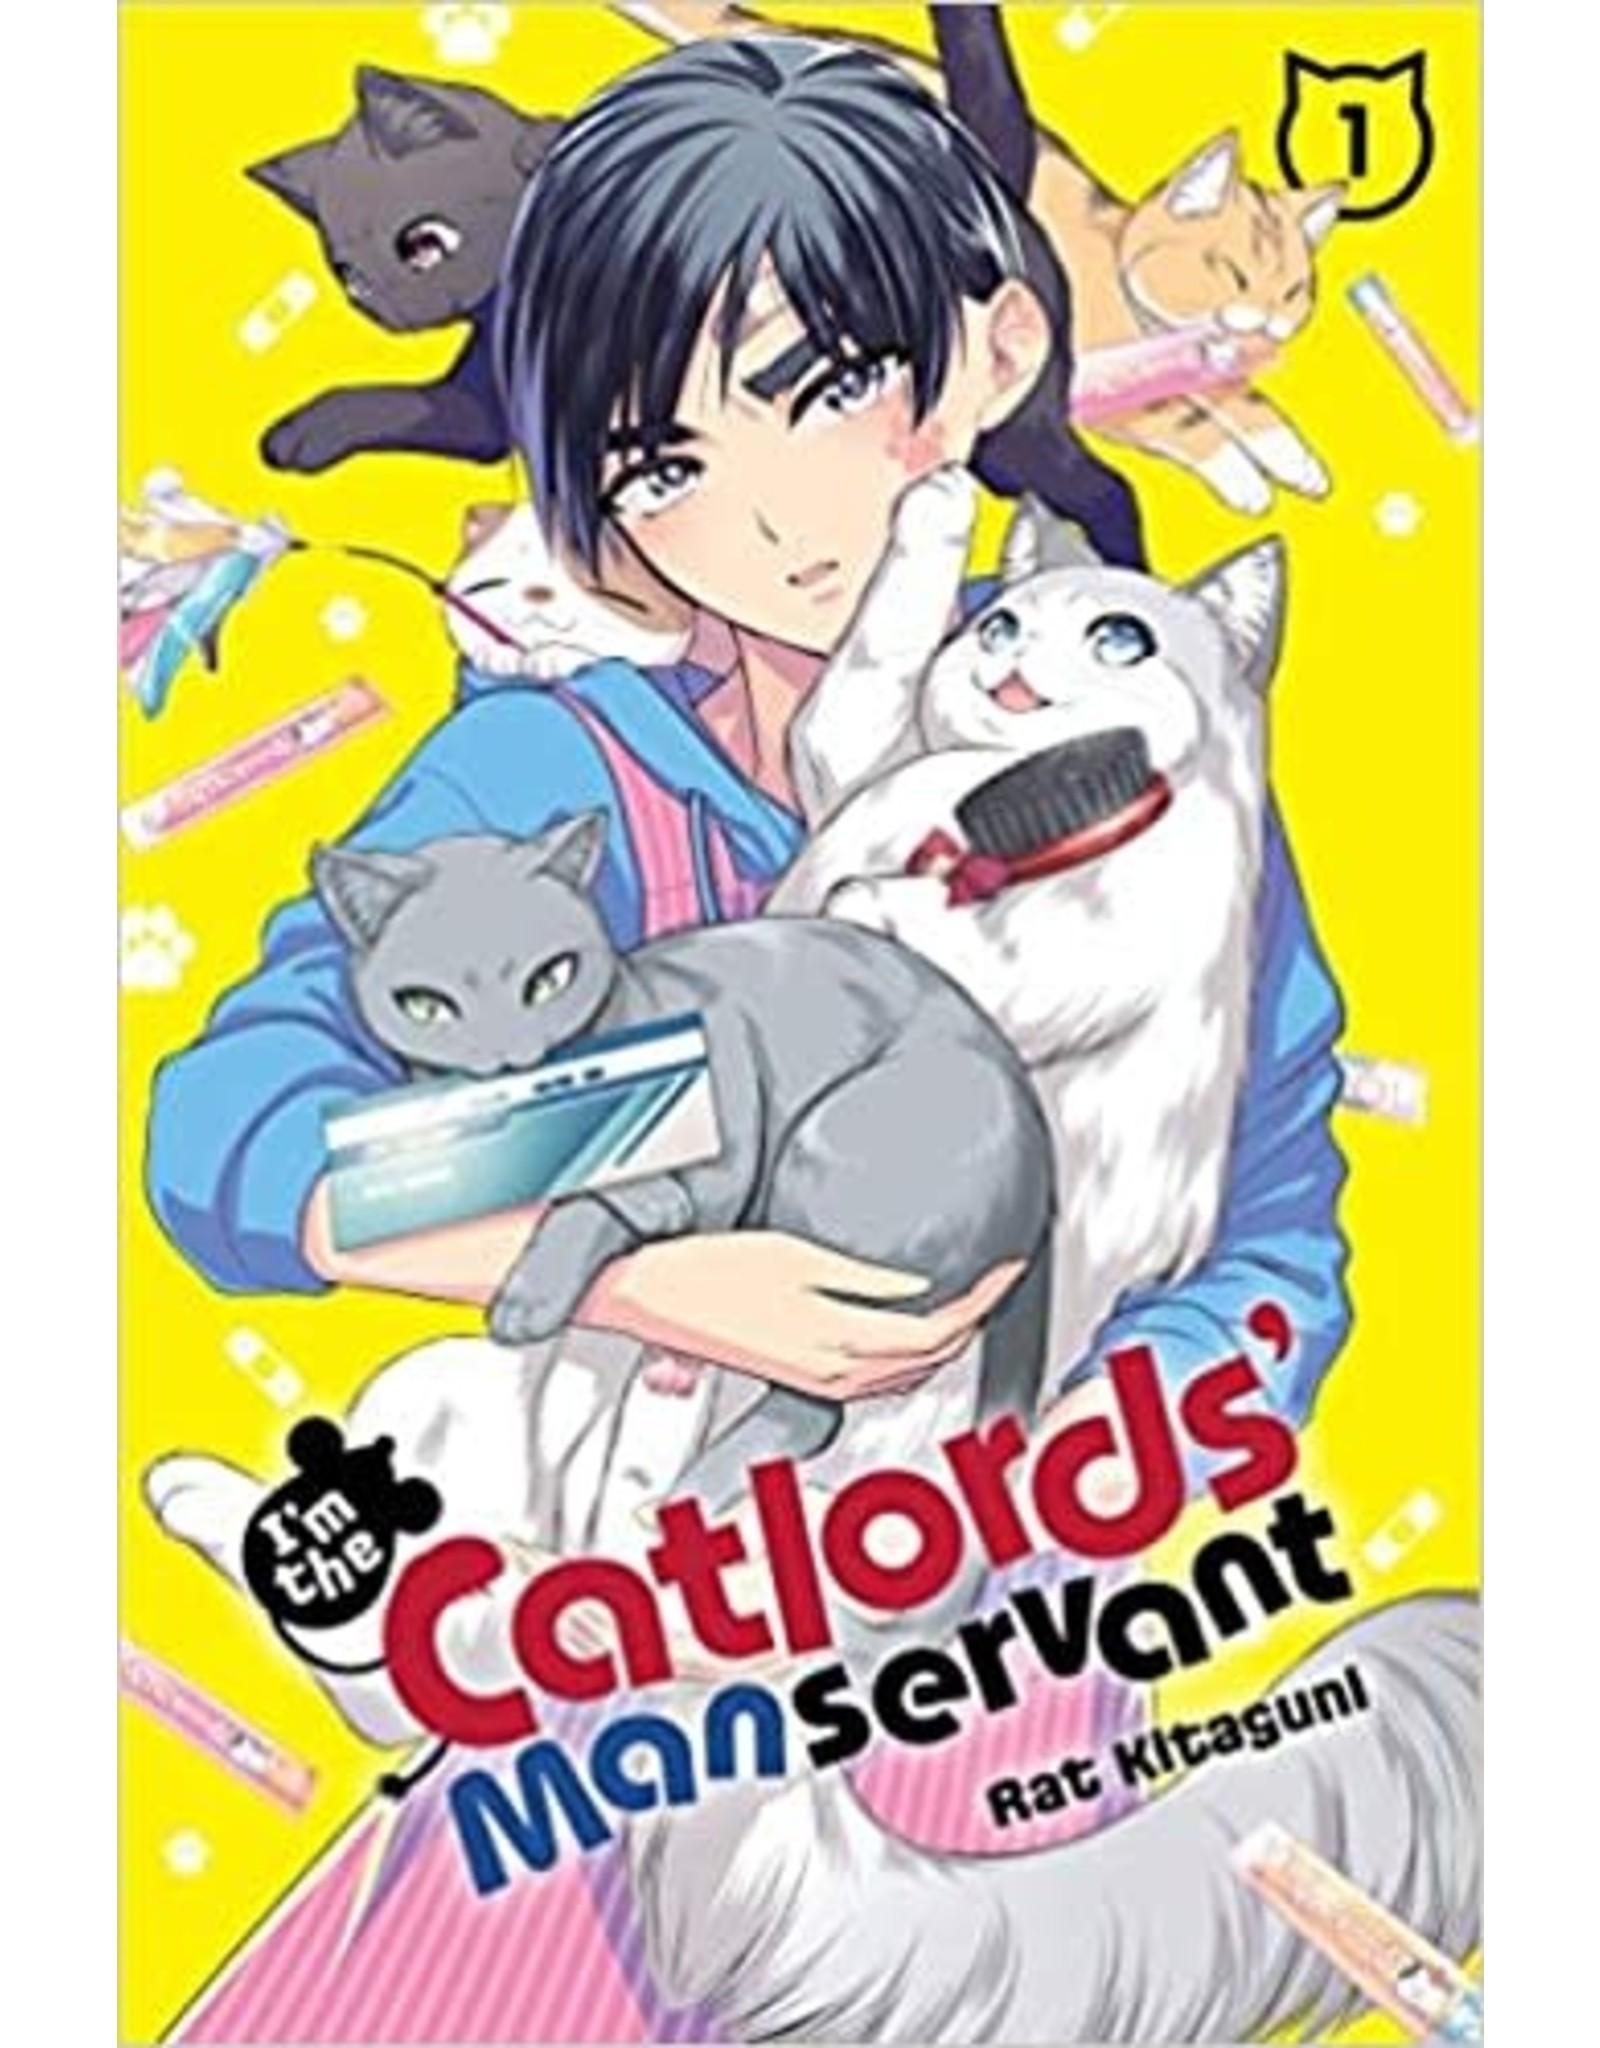 I'm The Catlords Manservant 1 (English) - Manga